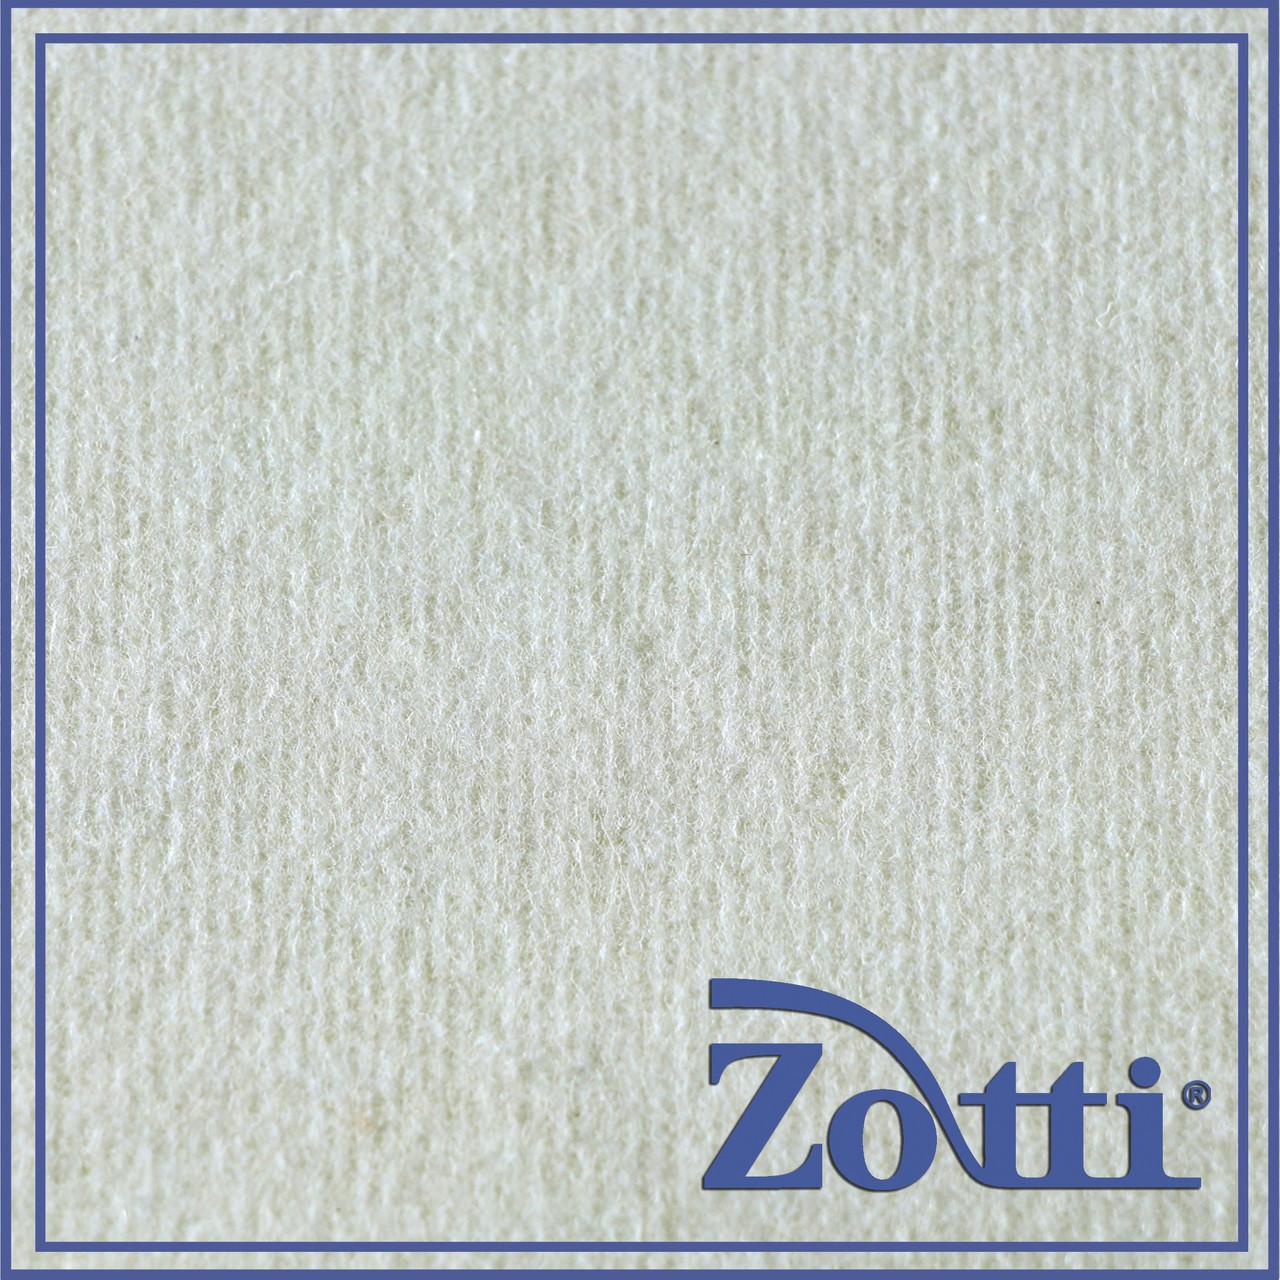 Дублирующая ткань CANAPINA R3 GXG 225 GA TERMO HI-TECH H160 (Италия)